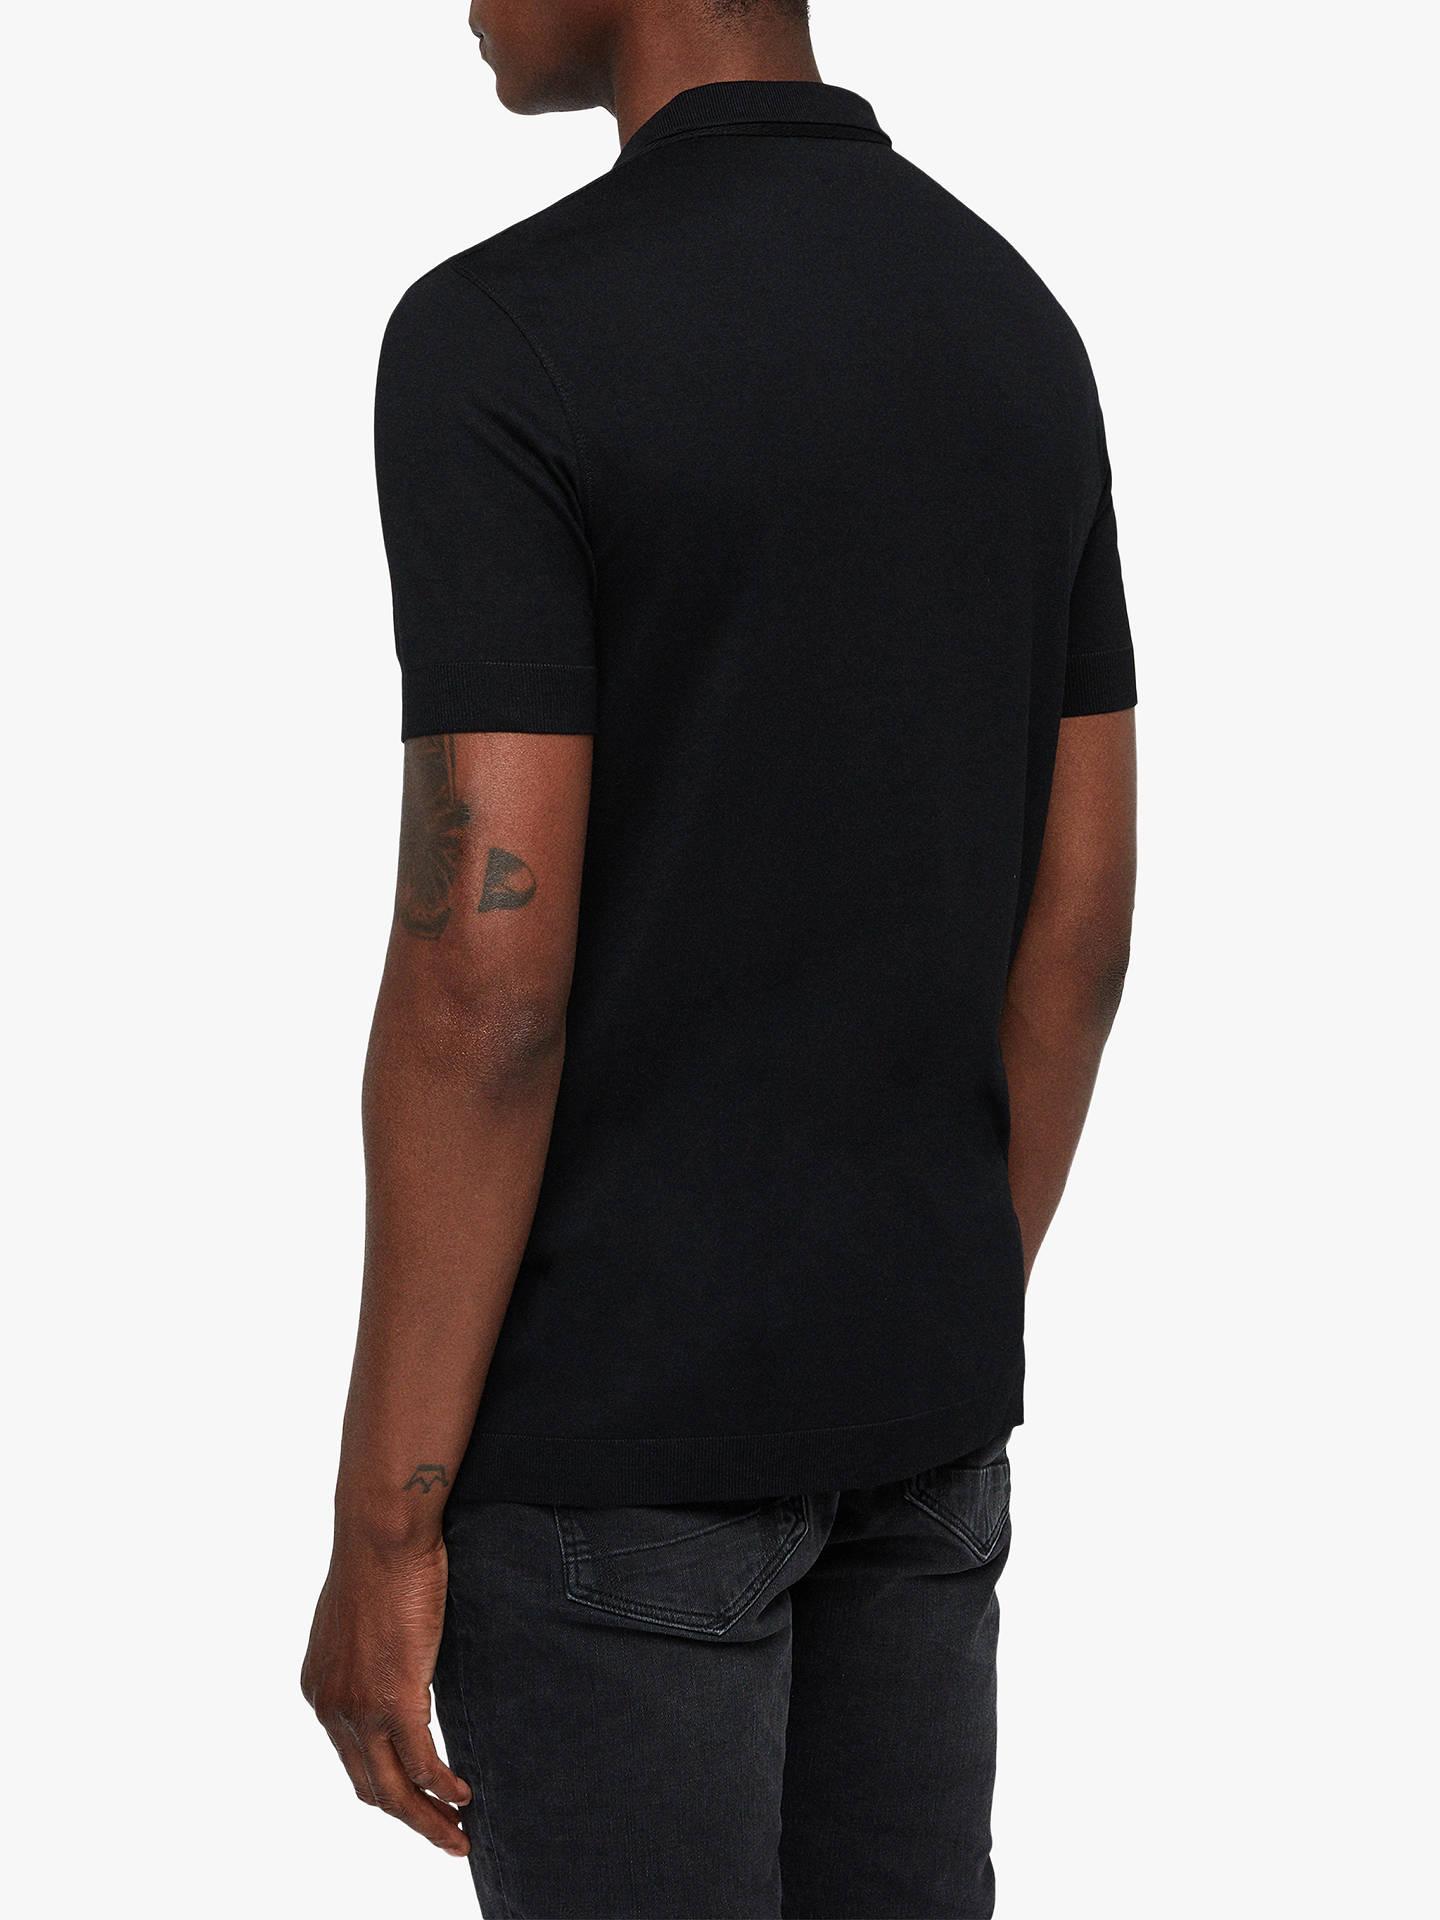 728dcf31 ... Buy AllSaints Parlour Short Sleeve Polo Shirt, Black, XS Online at  johnlewis.com ...